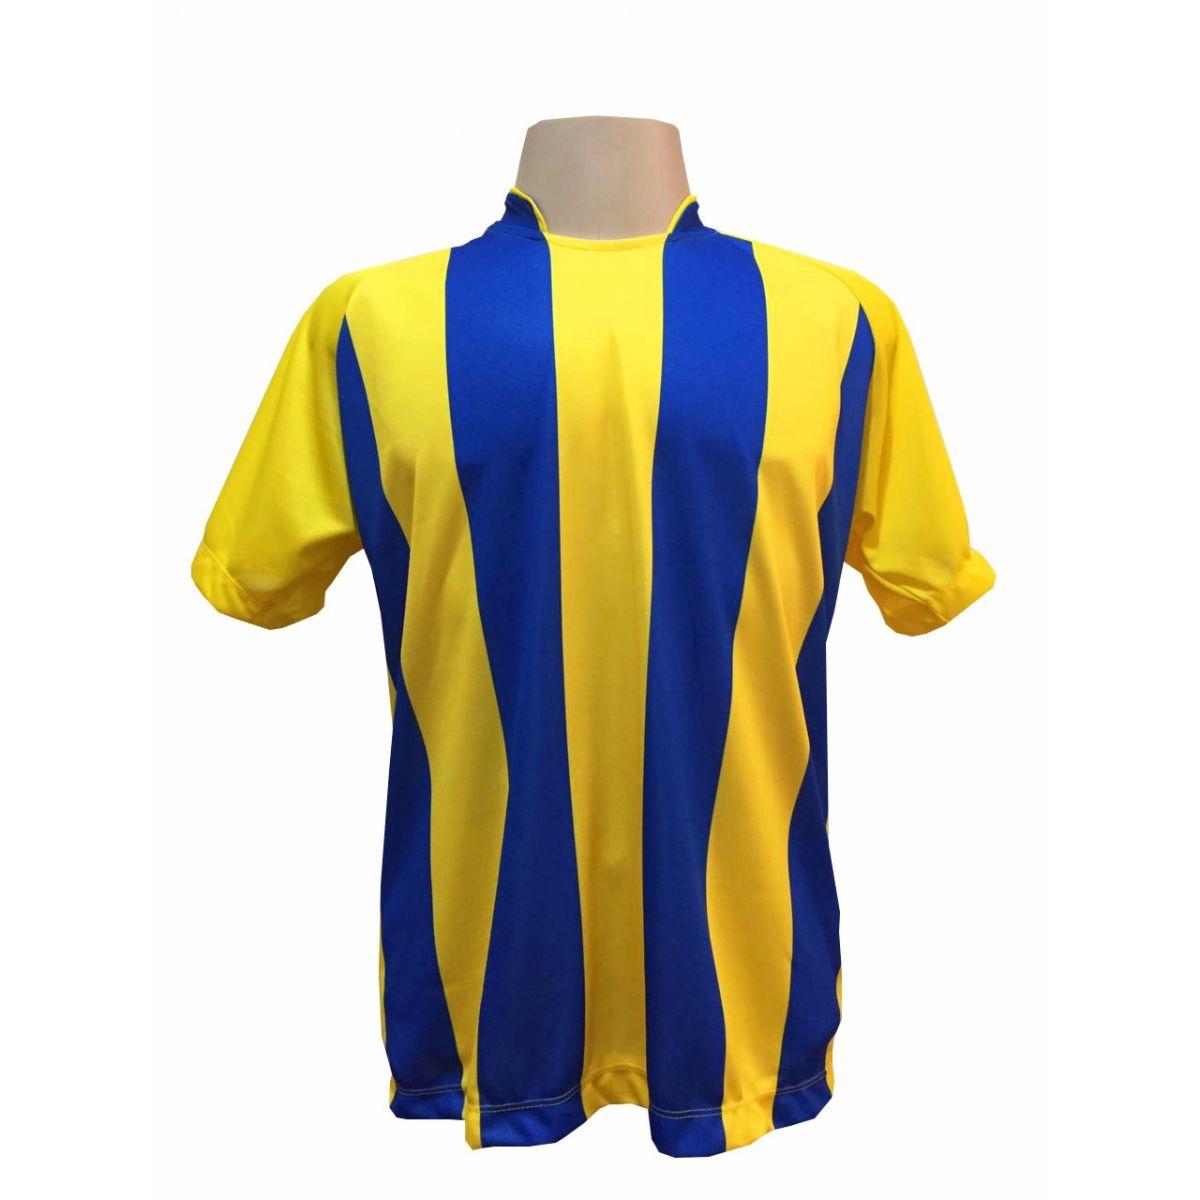 Jogo de Camisa com 12 unidades modelo Milan Amarelo/Royal + 1 Goleiro + Brindes